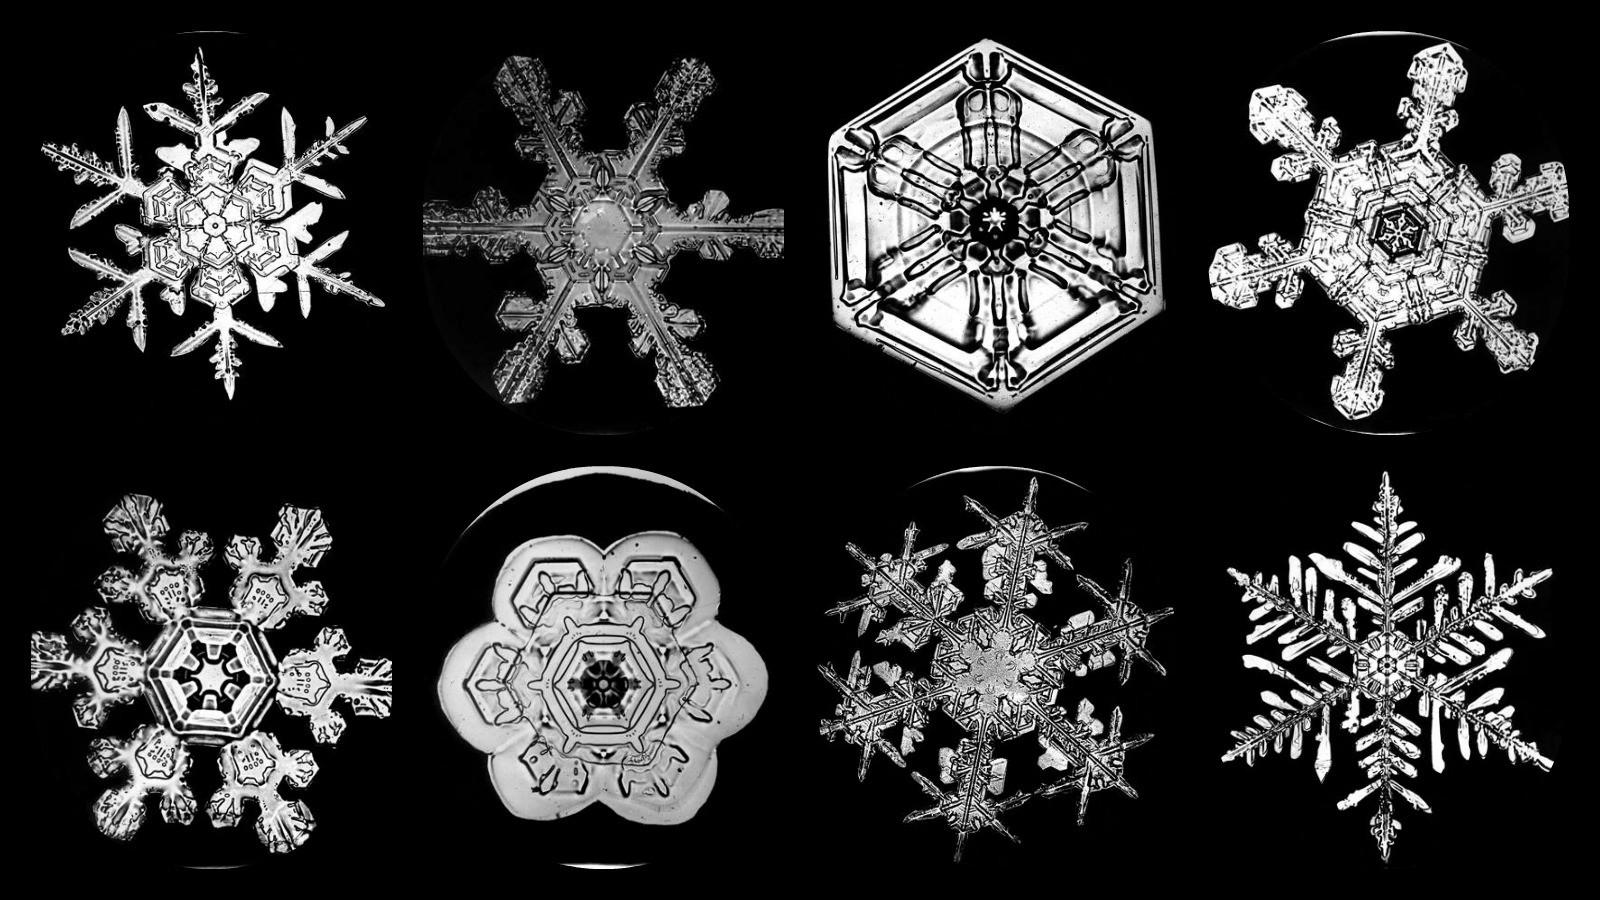 desky alwyn wikipedia wiki emulzi snowflake snima bentley sklenene ze wilson book